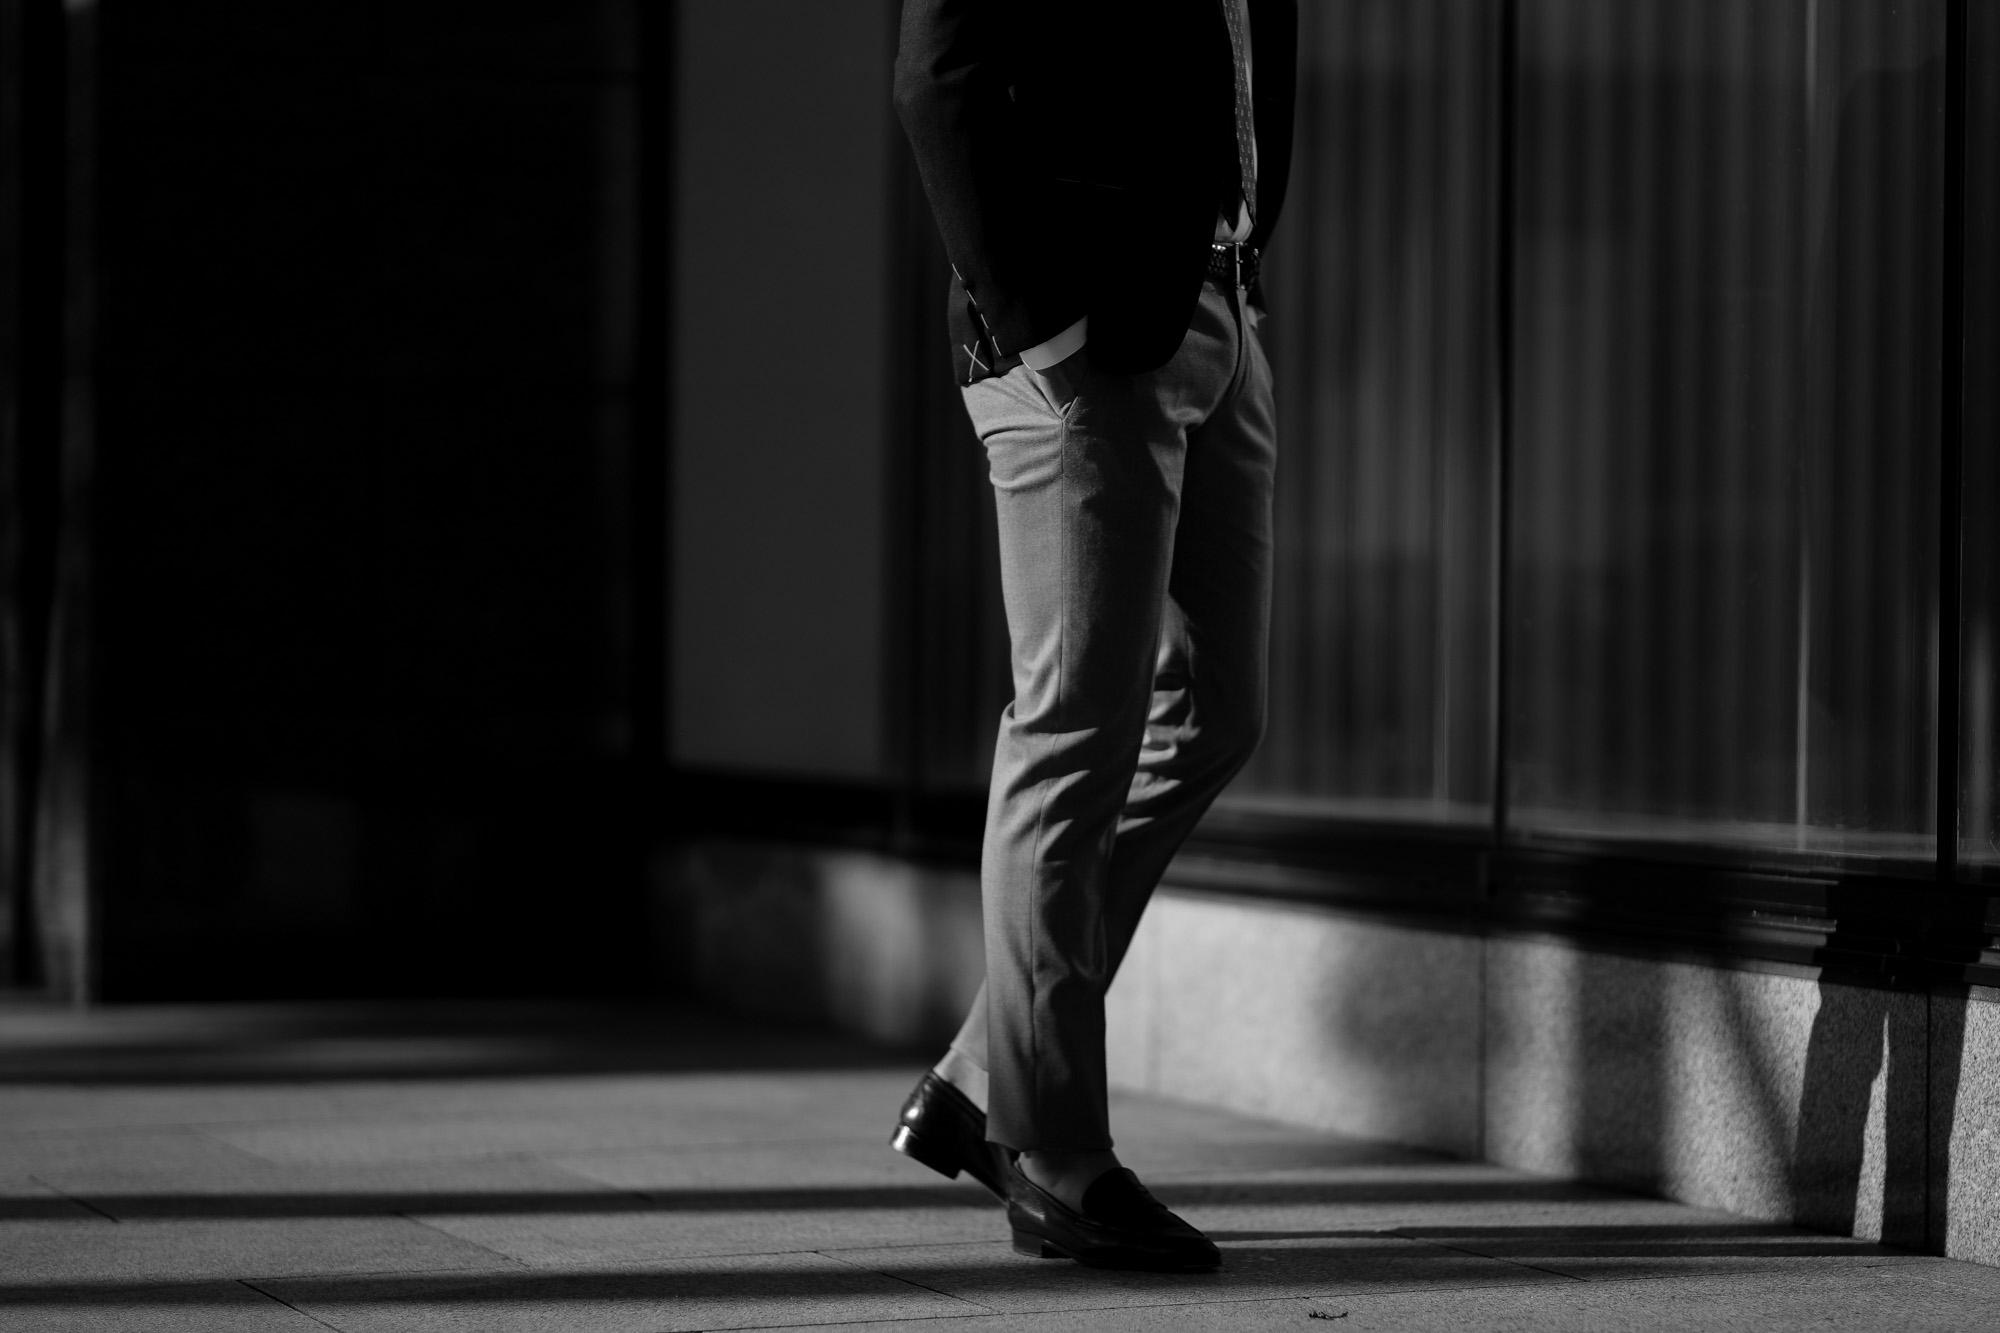 PT TORINO(ピーティートリノ) TRAVELLER (トラベラー) SUPER SLIM FIT (スーパースリムフィット) Stretch Techno Jersey ストレッチ テクノ ジャージ スラックス BLACK (ブラック・0990) 2020 秋冬 【ご予約受付中】愛知 名古屋 altoediritto アルトエデリット